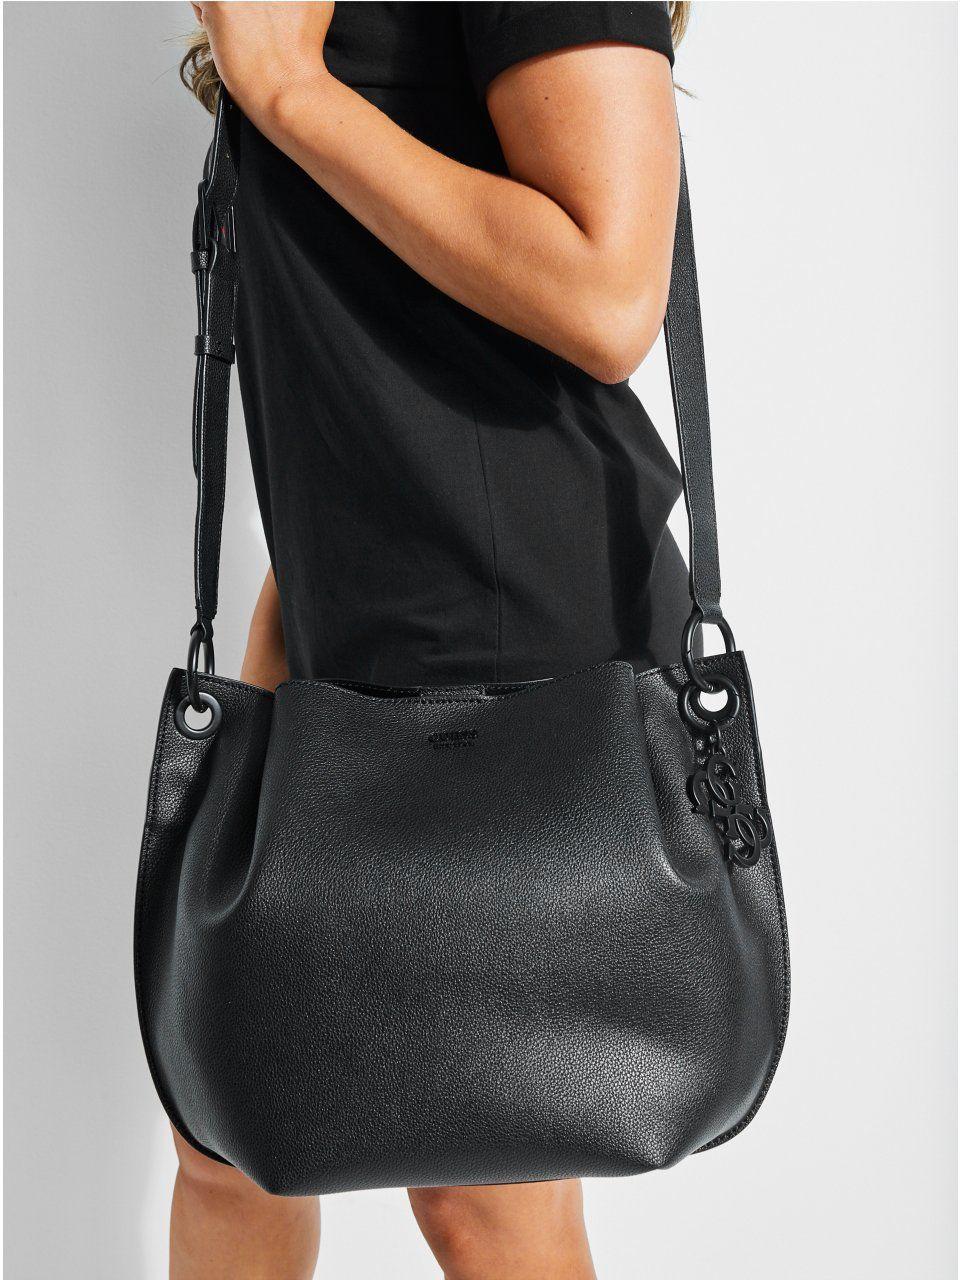 Digital Pebbled Hobo Bag | Bags, Shoulder bag, Curvy fashion